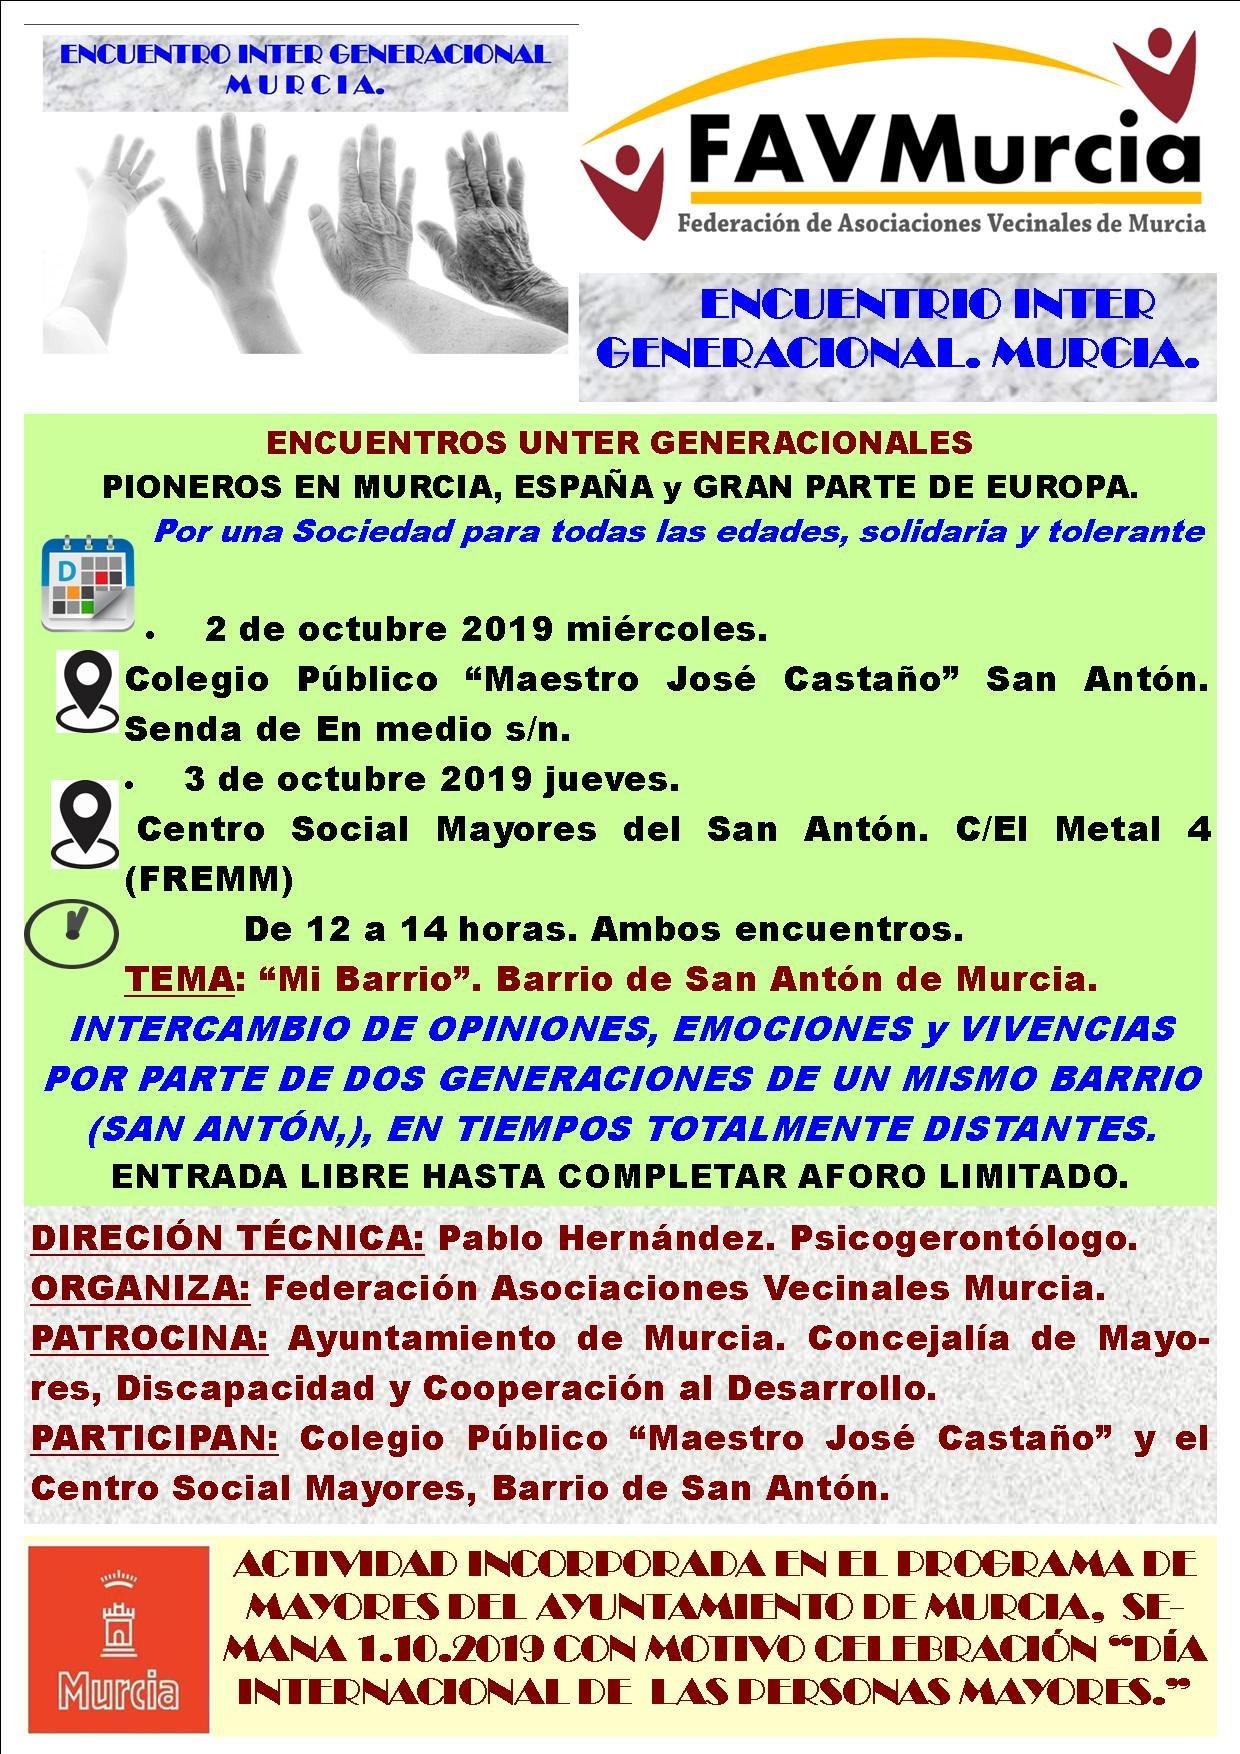 FAVMurcia Encuentro intergeneracional